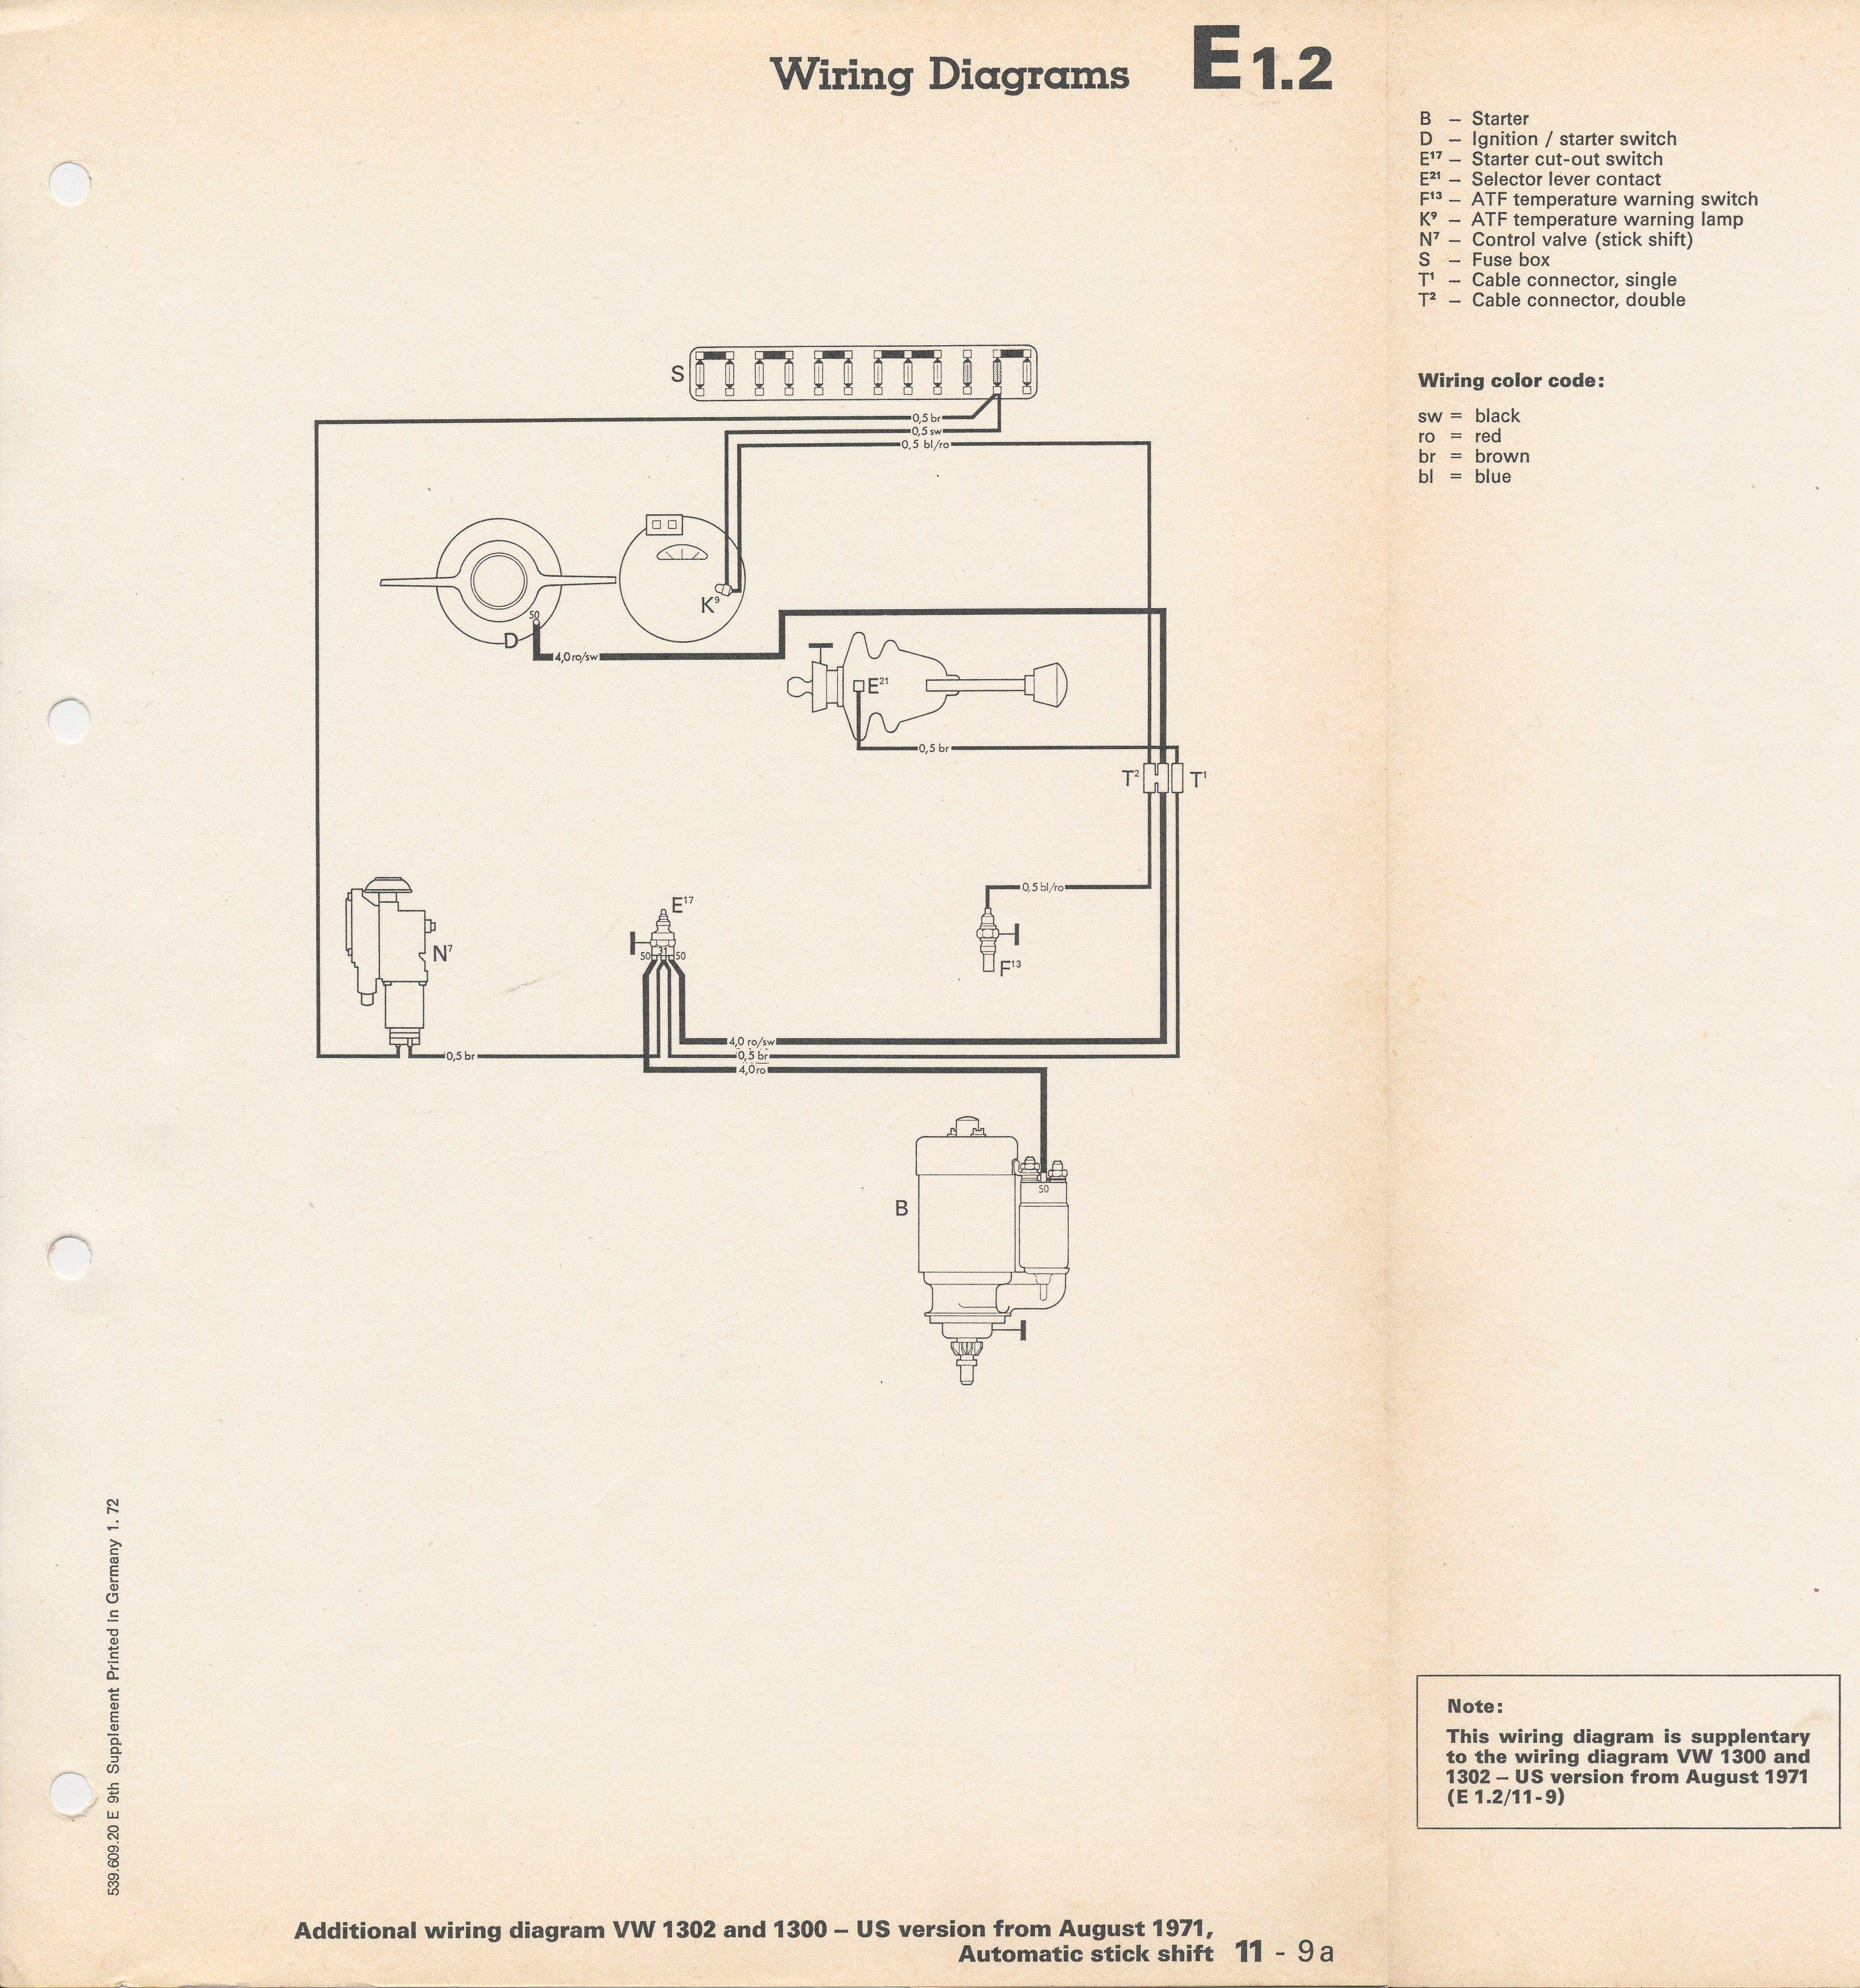 1972 Super Beetle Autostick Wiring Diagram Download Diagrams 1968 Vw 24 Images 1973